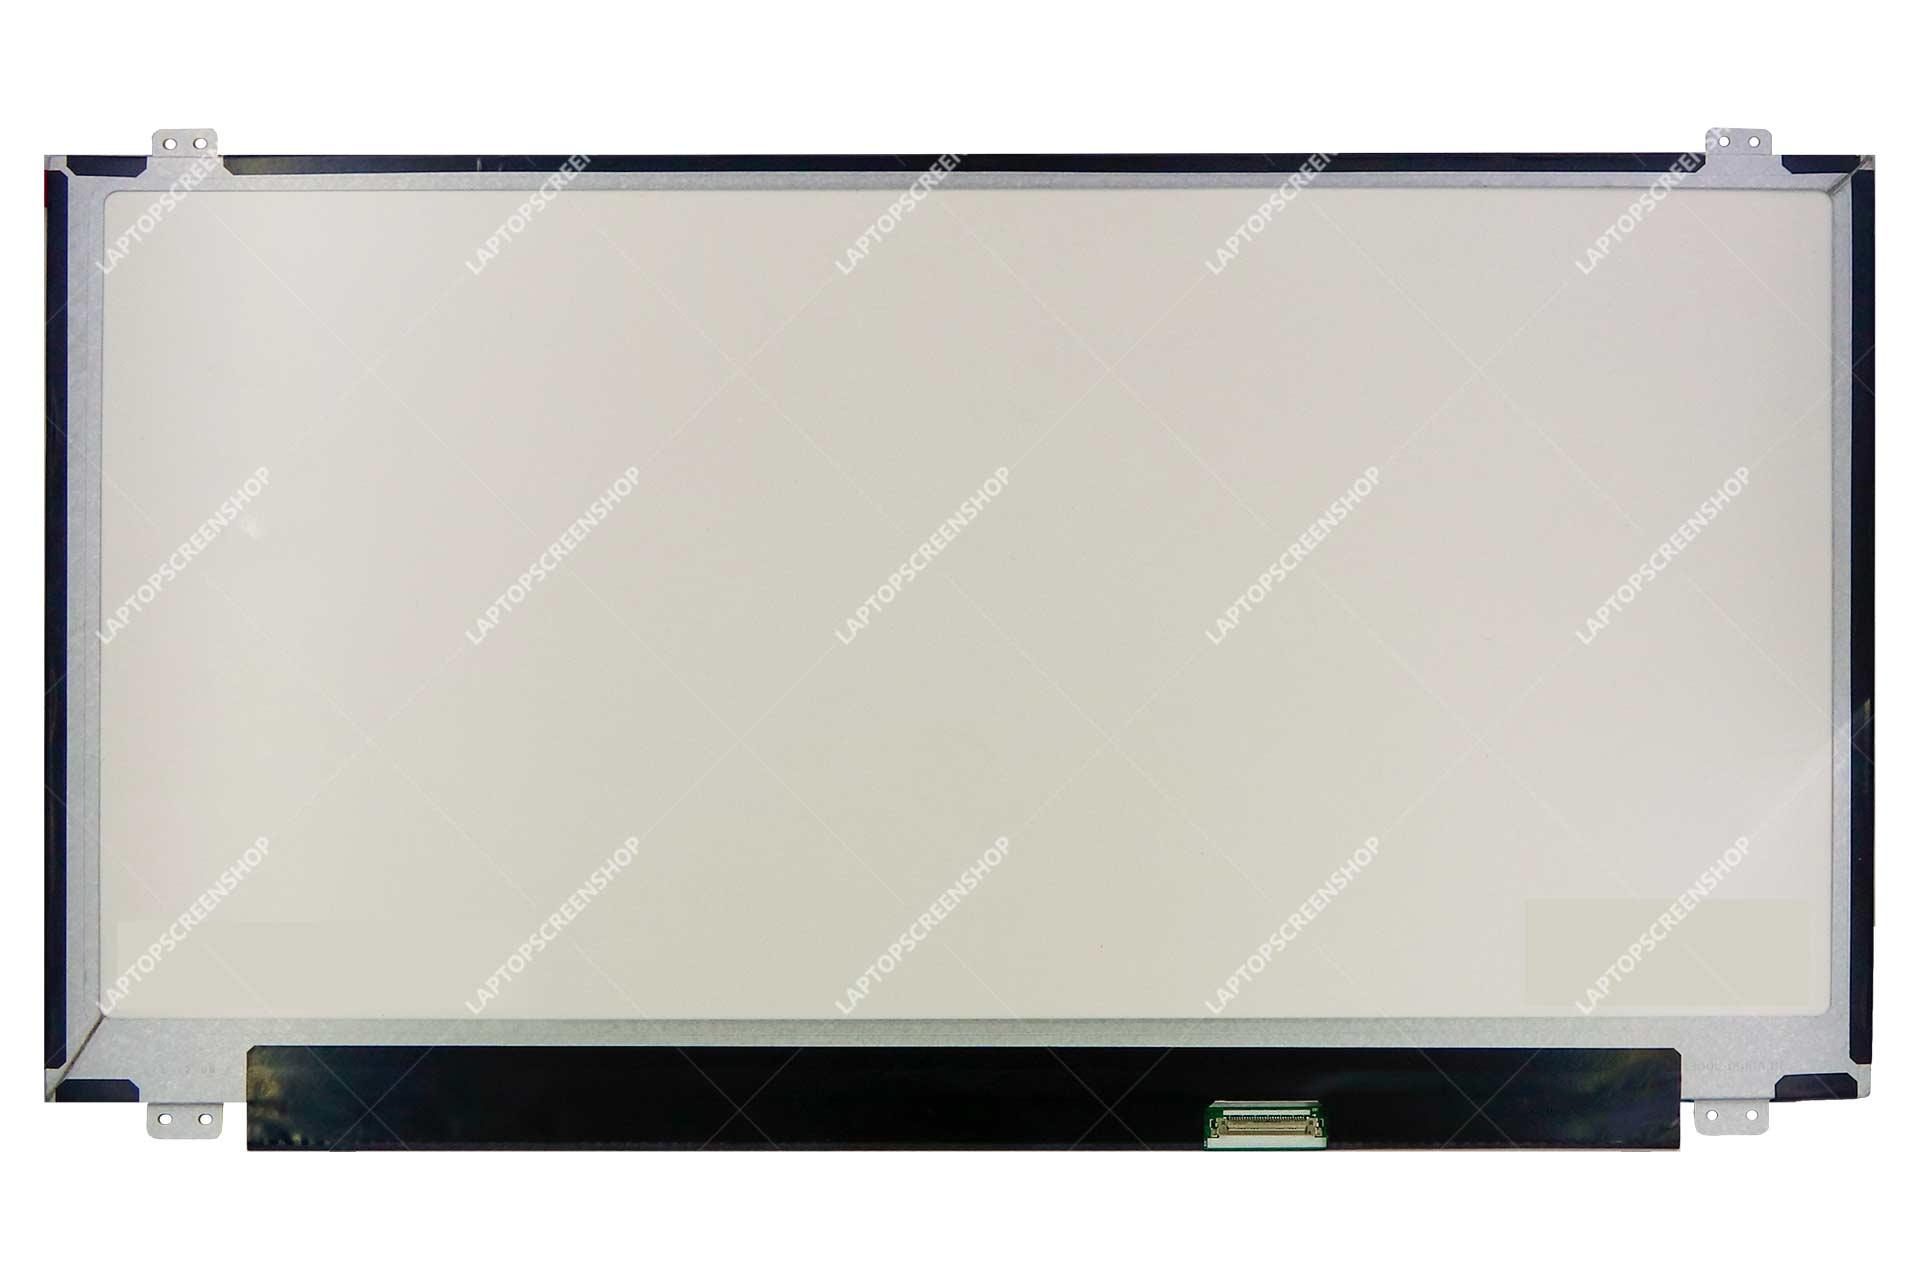 ACER-ASPIRE-E1-570G-6462-LCD |HD|فروشگاه لپ تاپ اسکرين | تعمير لپ تاپ